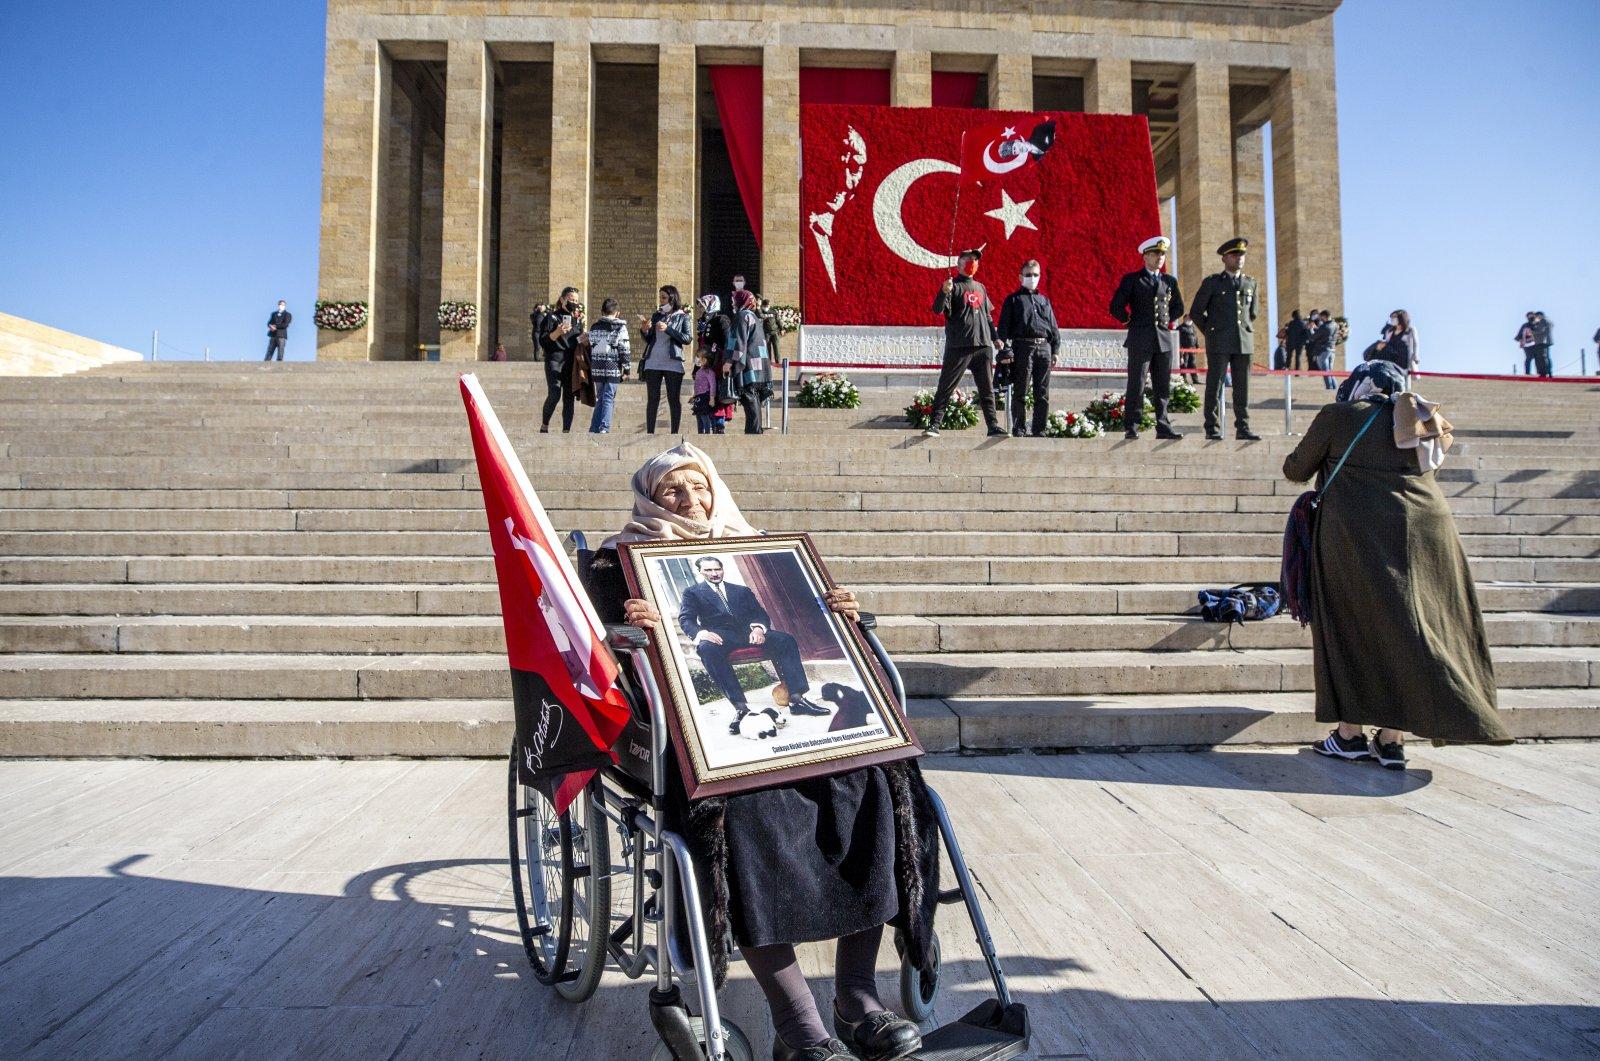 Gülten Gönen, 87, holds a portrait of Mustafa Kemal Atatürk outside his mauseloum Anıtkabir, in the capital Ankara, Turkey, Nov. 10, 2020. (AA Photo)